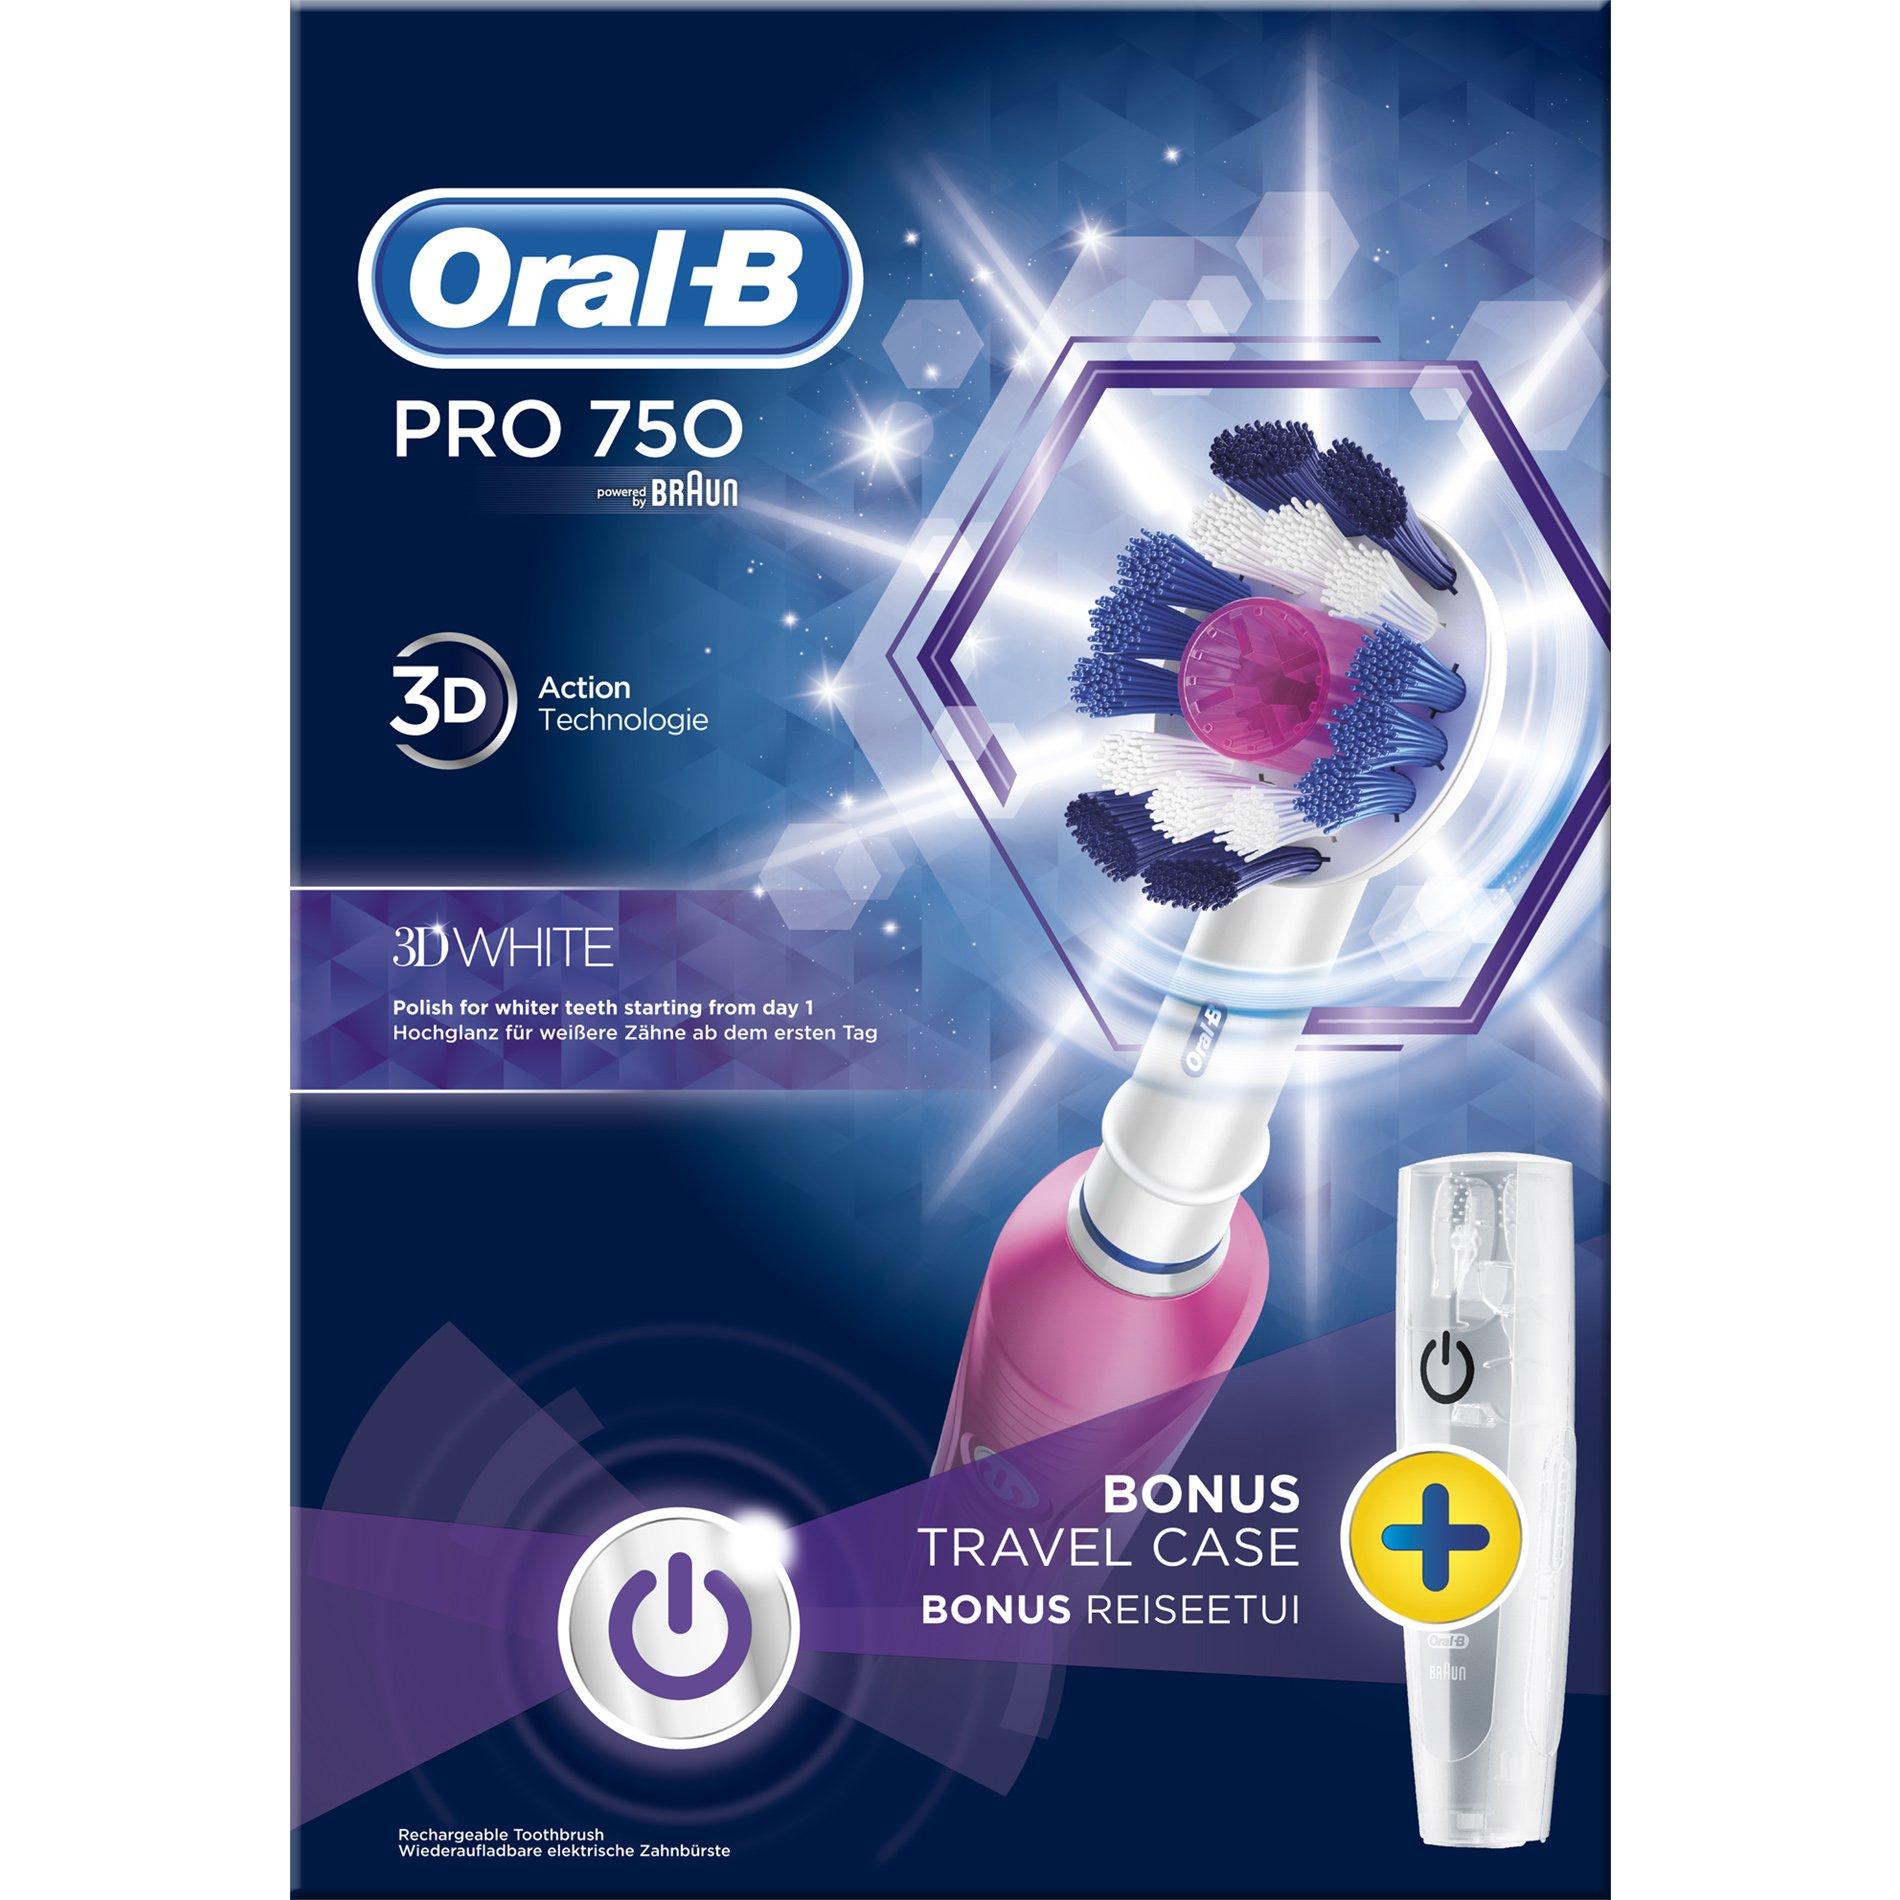 Oral-B Pro 750 3D White Special Edition Ηλεκτρική Οδοντόβουρτσα για Βαθύ Καθαρισμό σε Ροζ Χρώμα